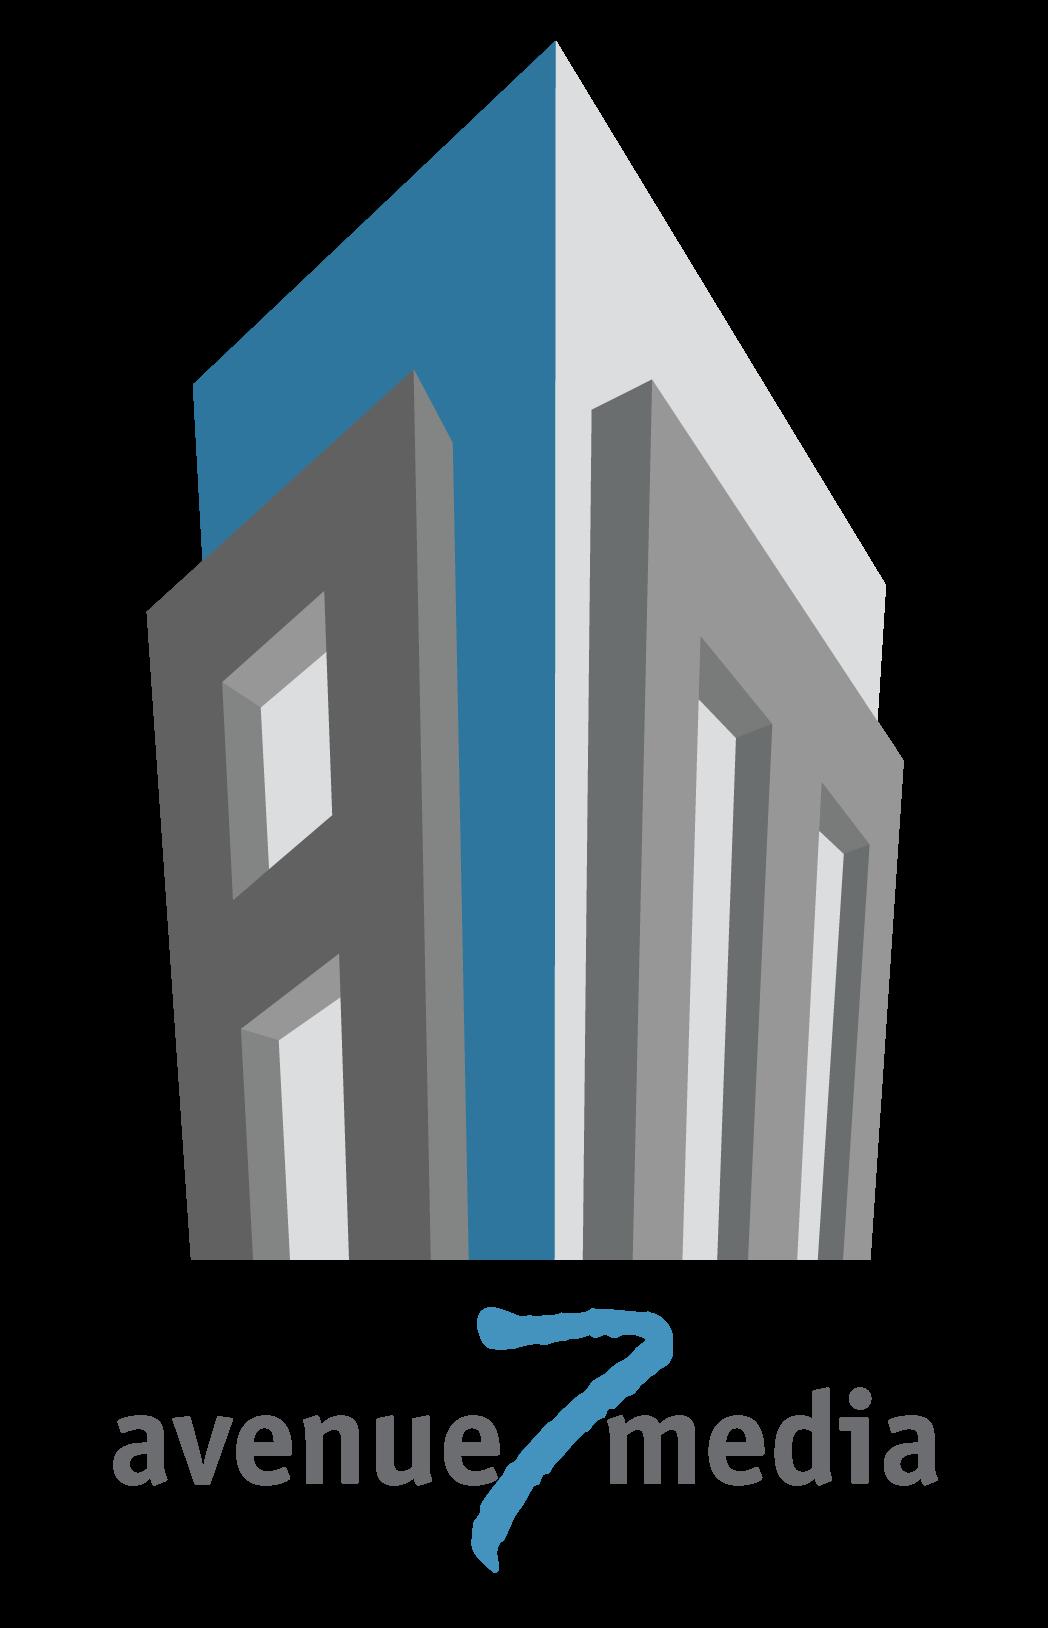 avenue7media logo